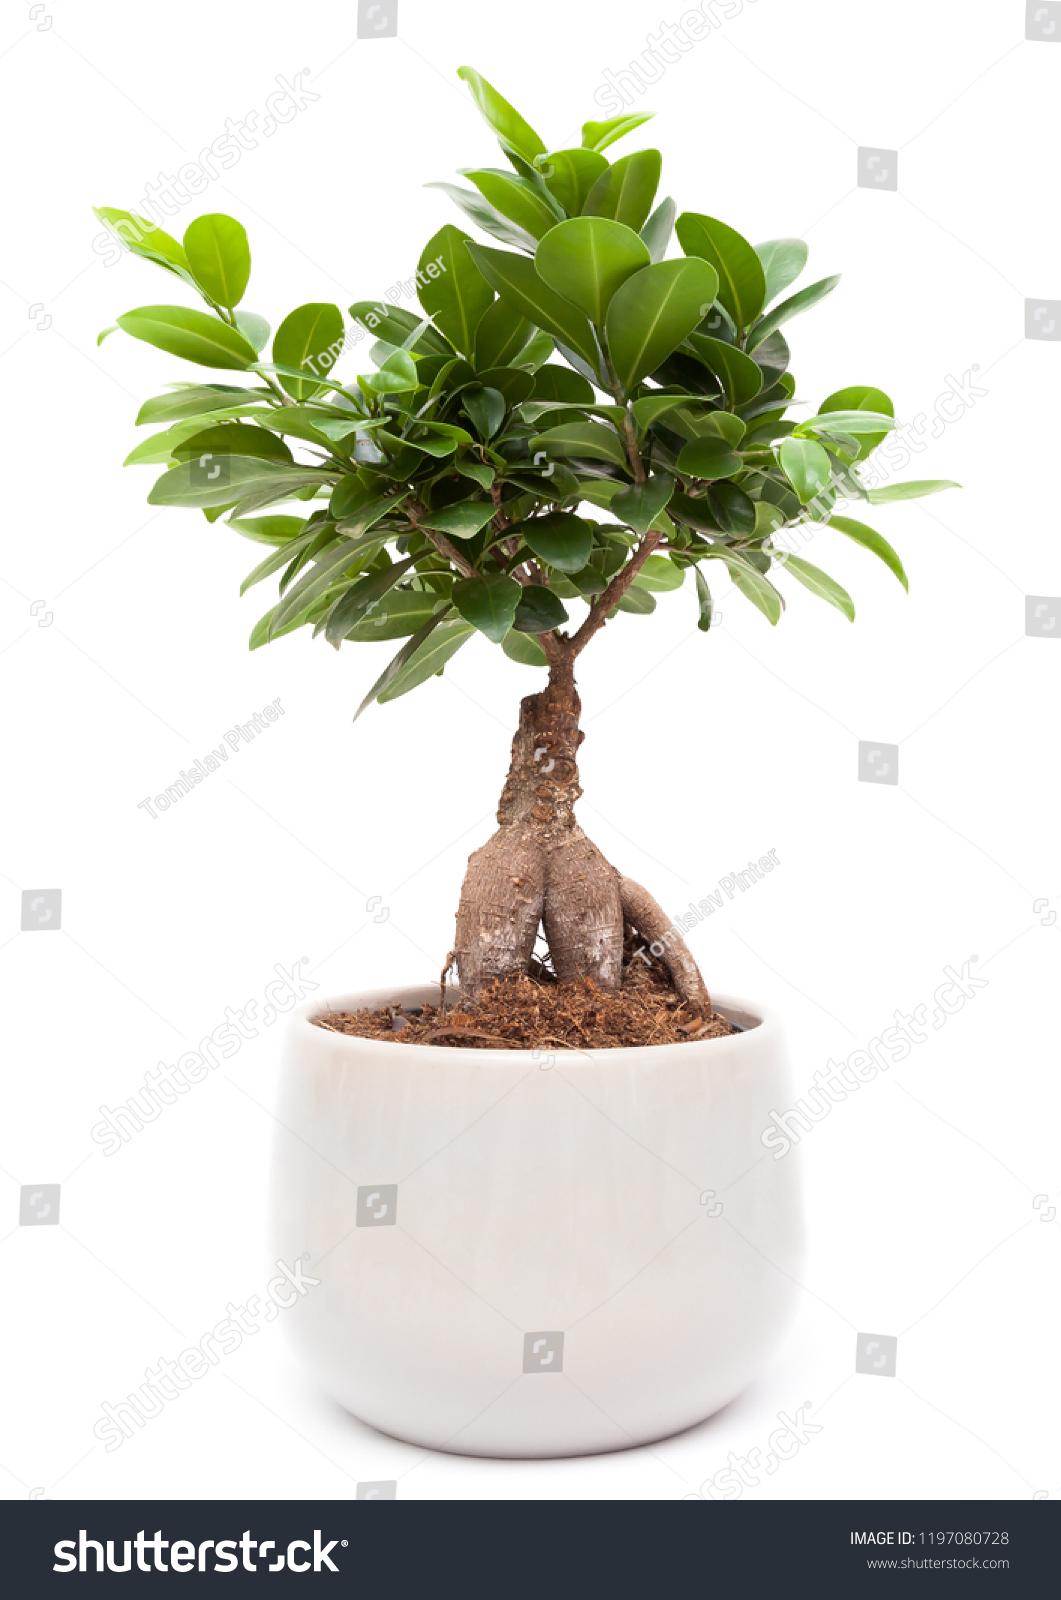 Ficus Ginseng Bonsai Care Of Ficus Microcarpa Ginseng Pflanze Mit